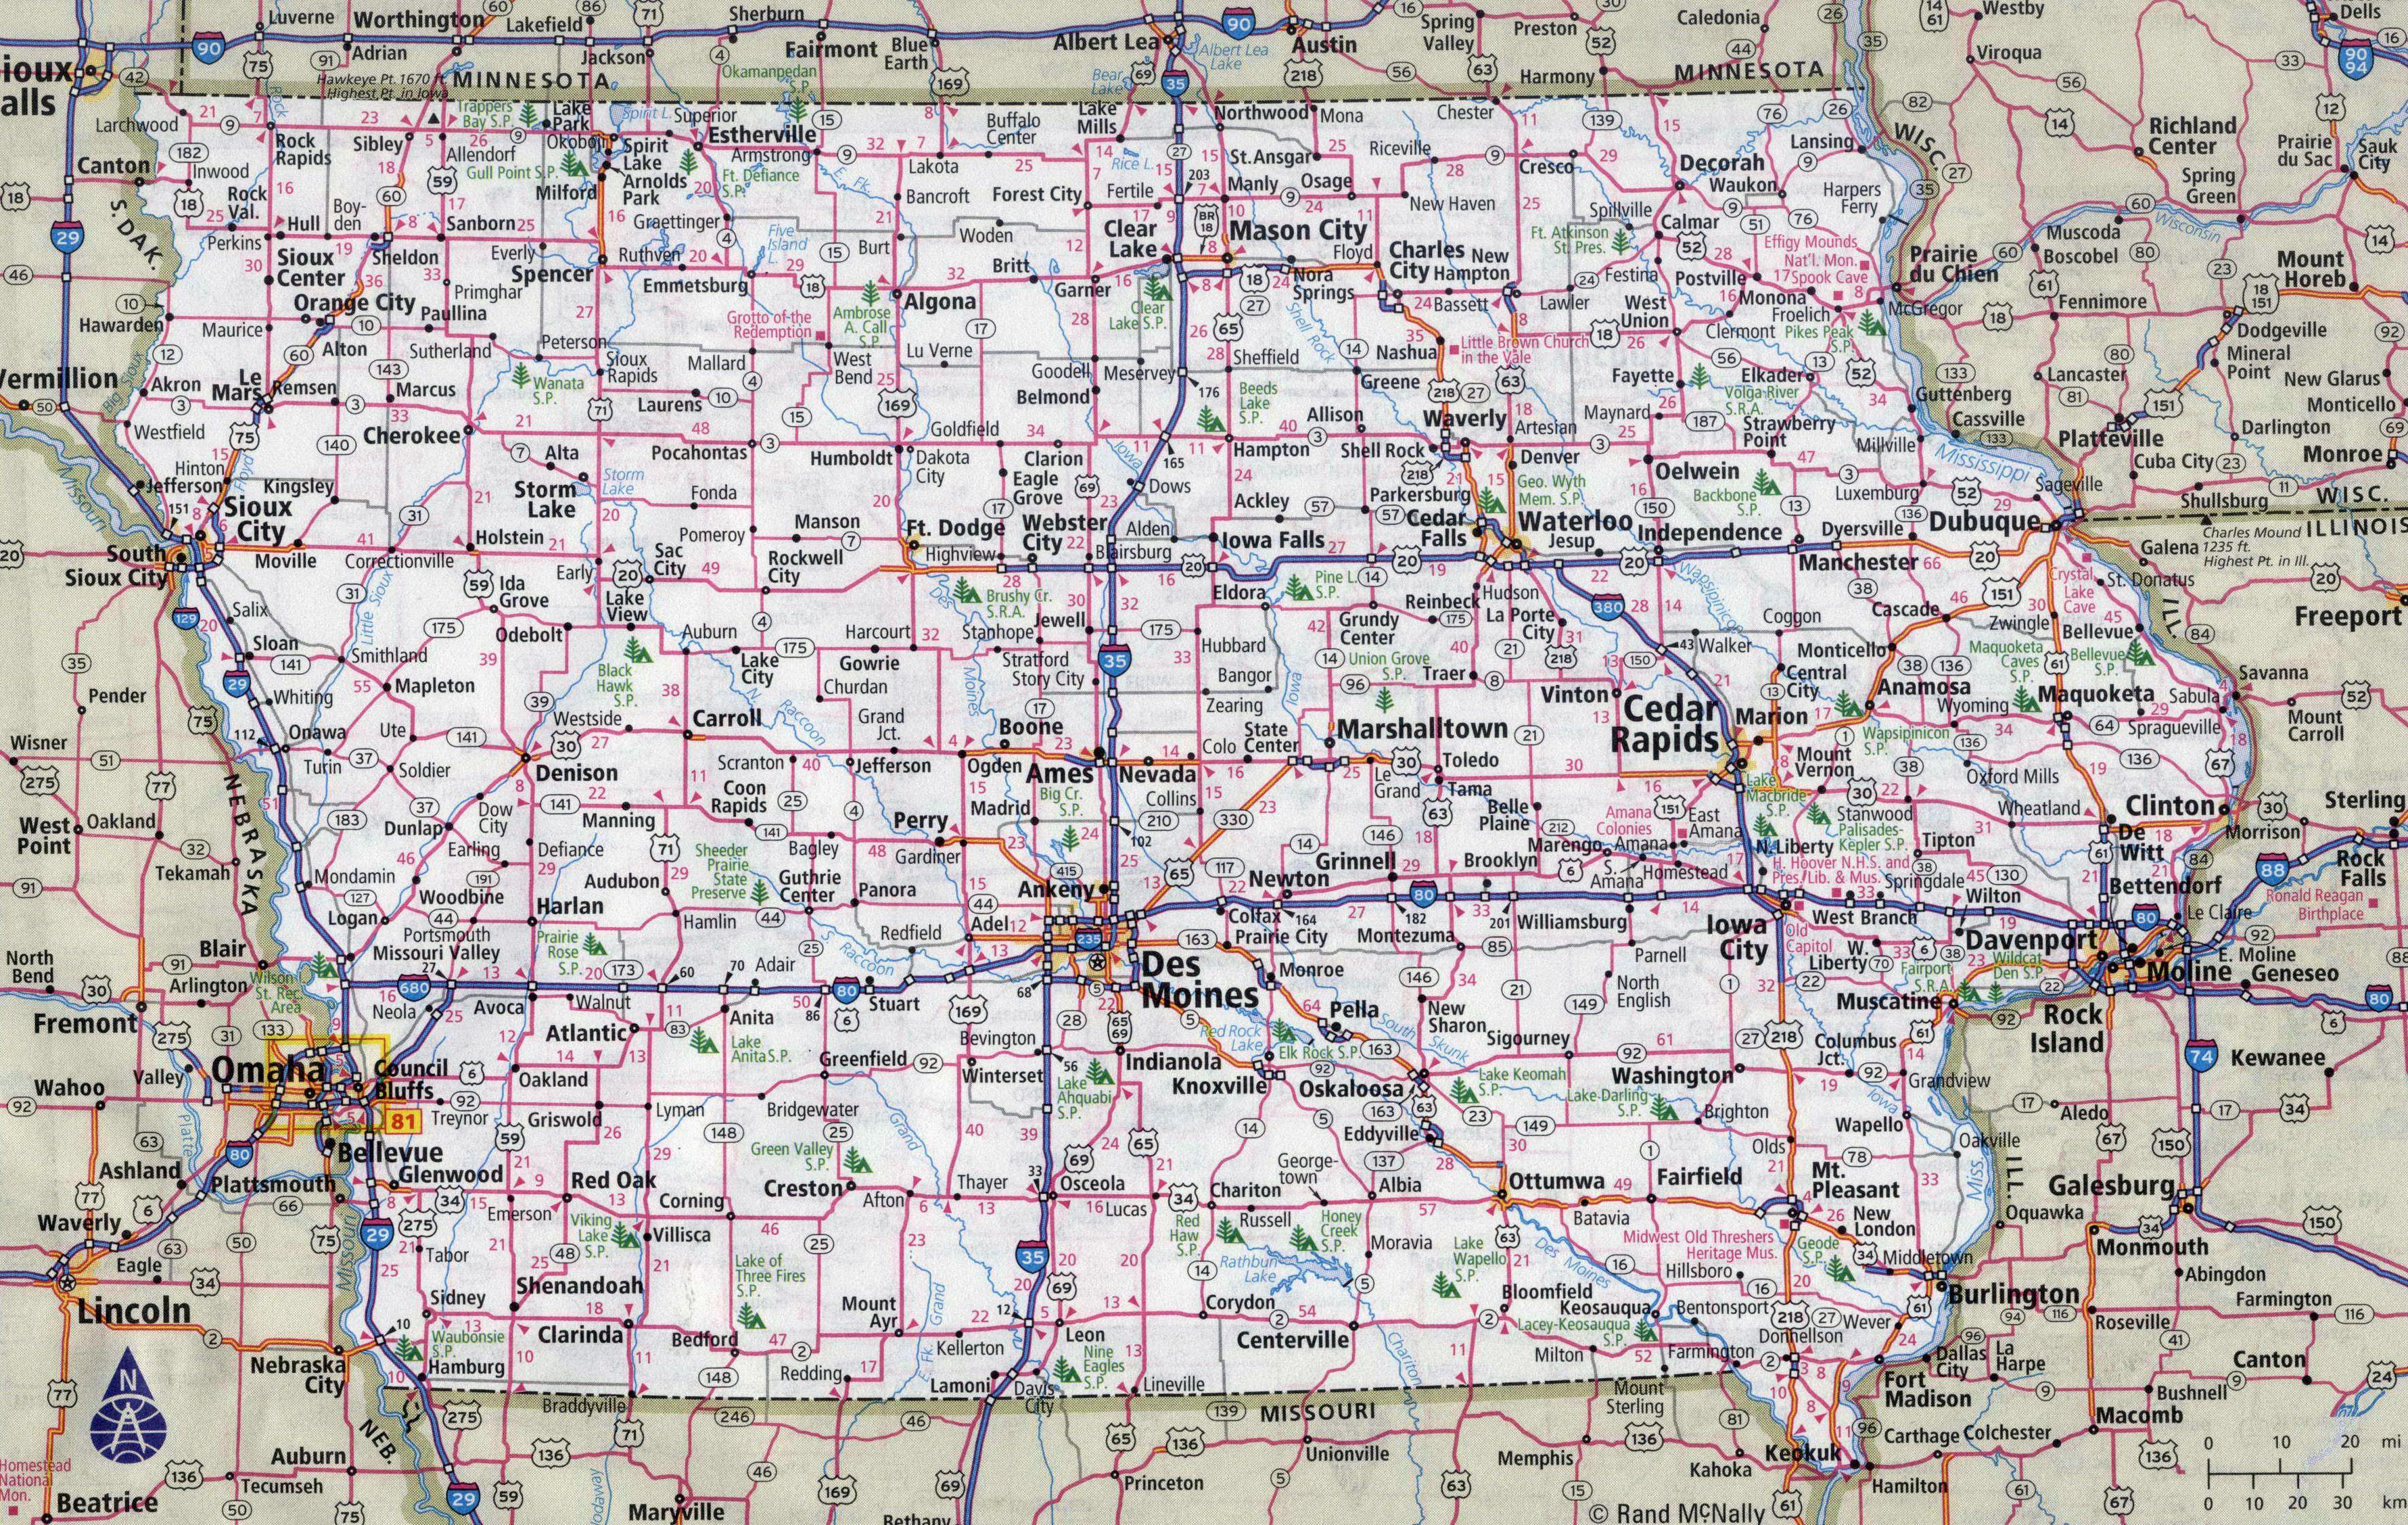 Largedetailedroadsandhighwaysmapofiowastatewithcities - Iowa map of us